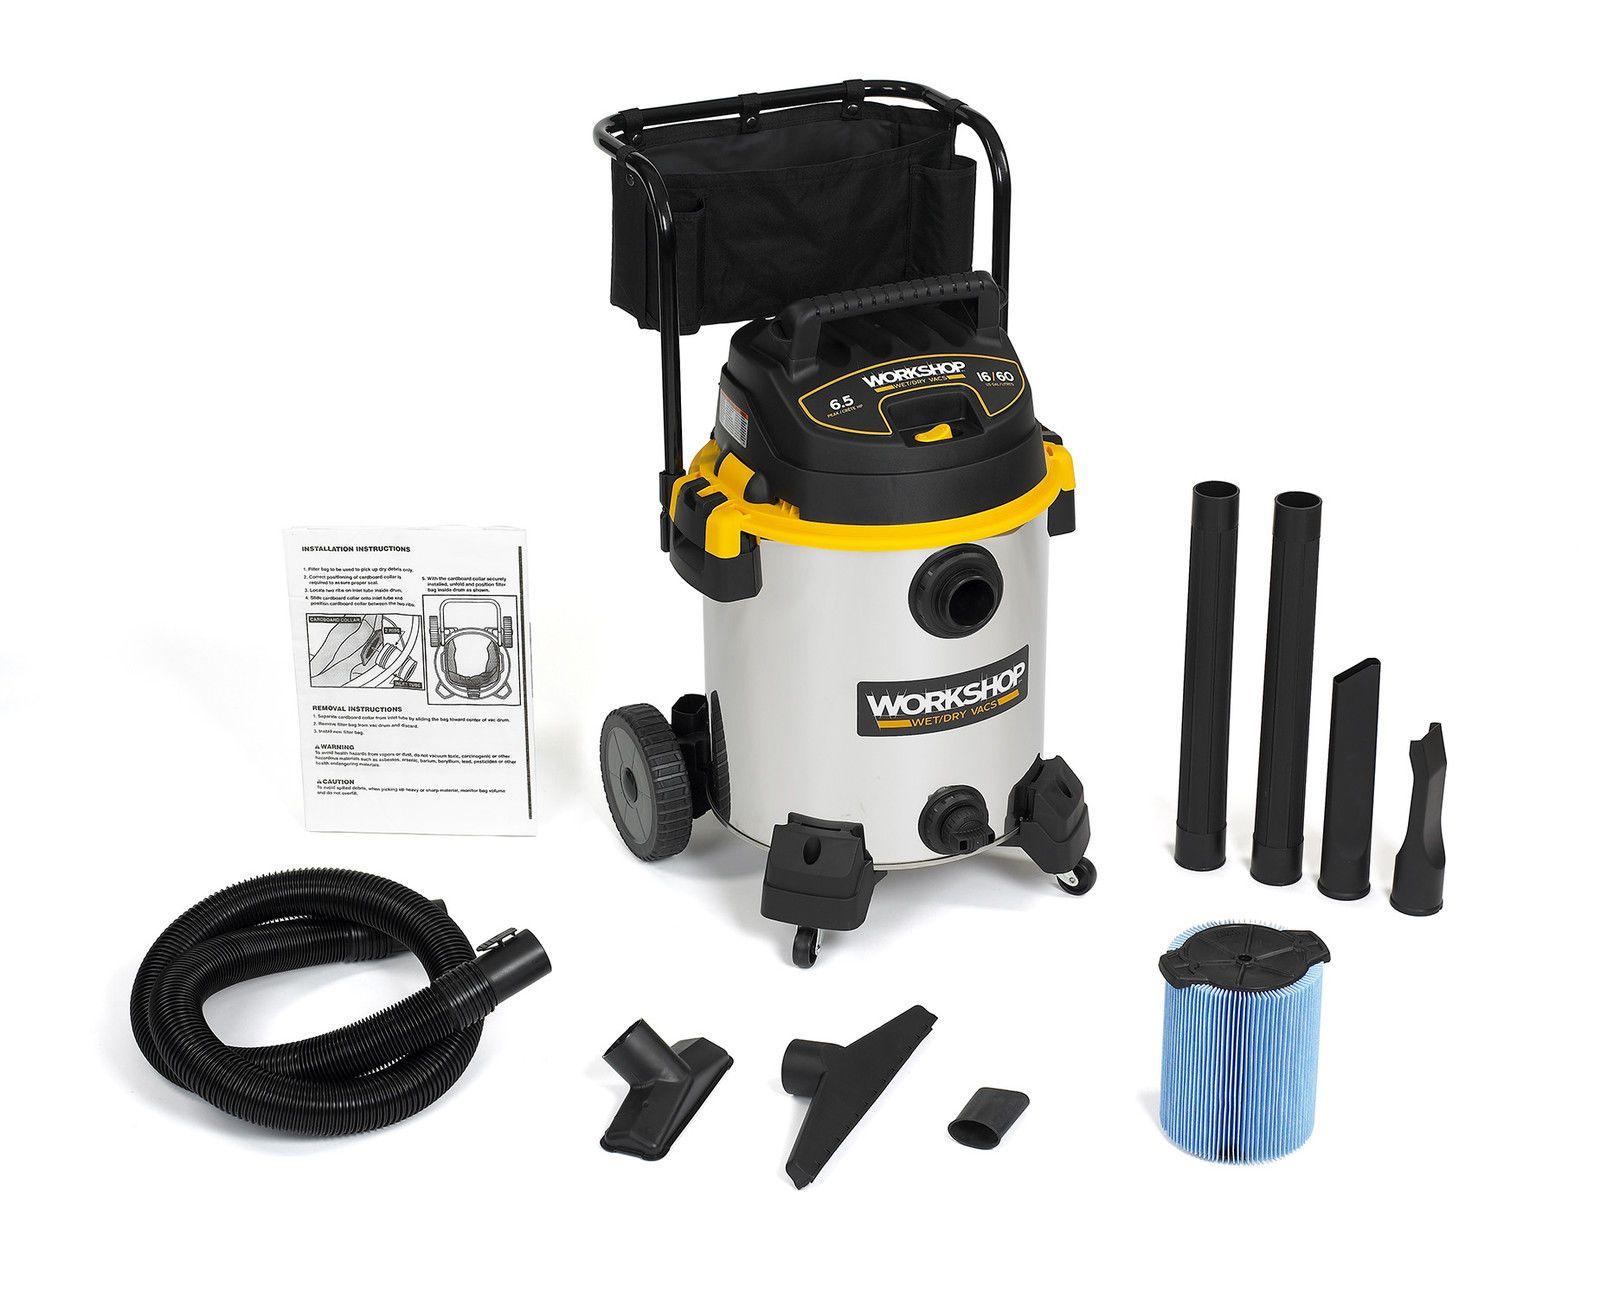 Details About Workshop Wet Dry Vacs Ws1600ss Stainless Steel 16 Gallon 6 5 Peak Hp Shop Vacuum Wet Dry Vacuum Cleaner Best Vacuum Hose Storage